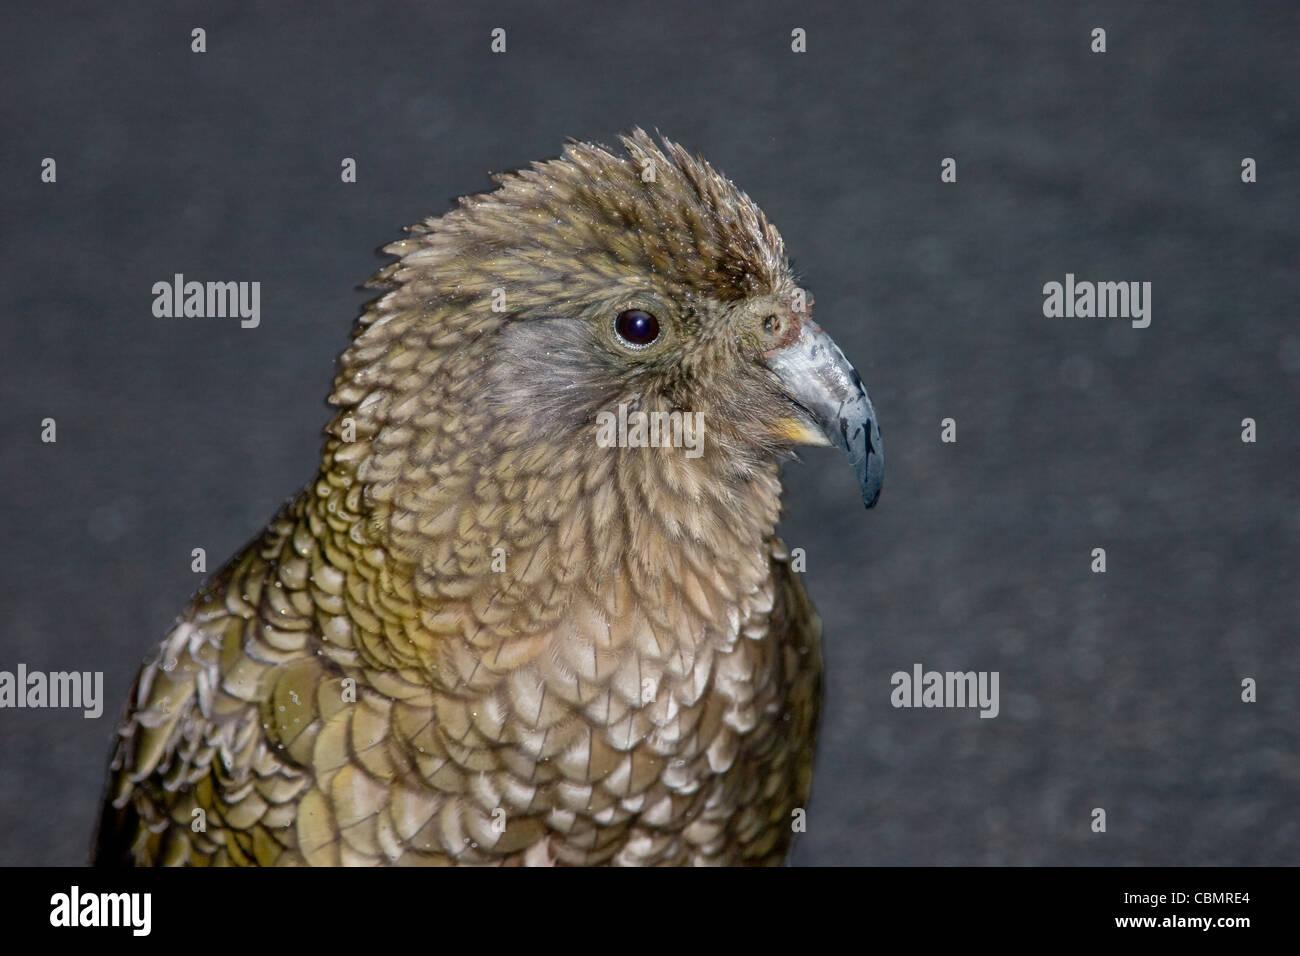 New Zealand kea mountain parrot closeup portrait Stock Photo